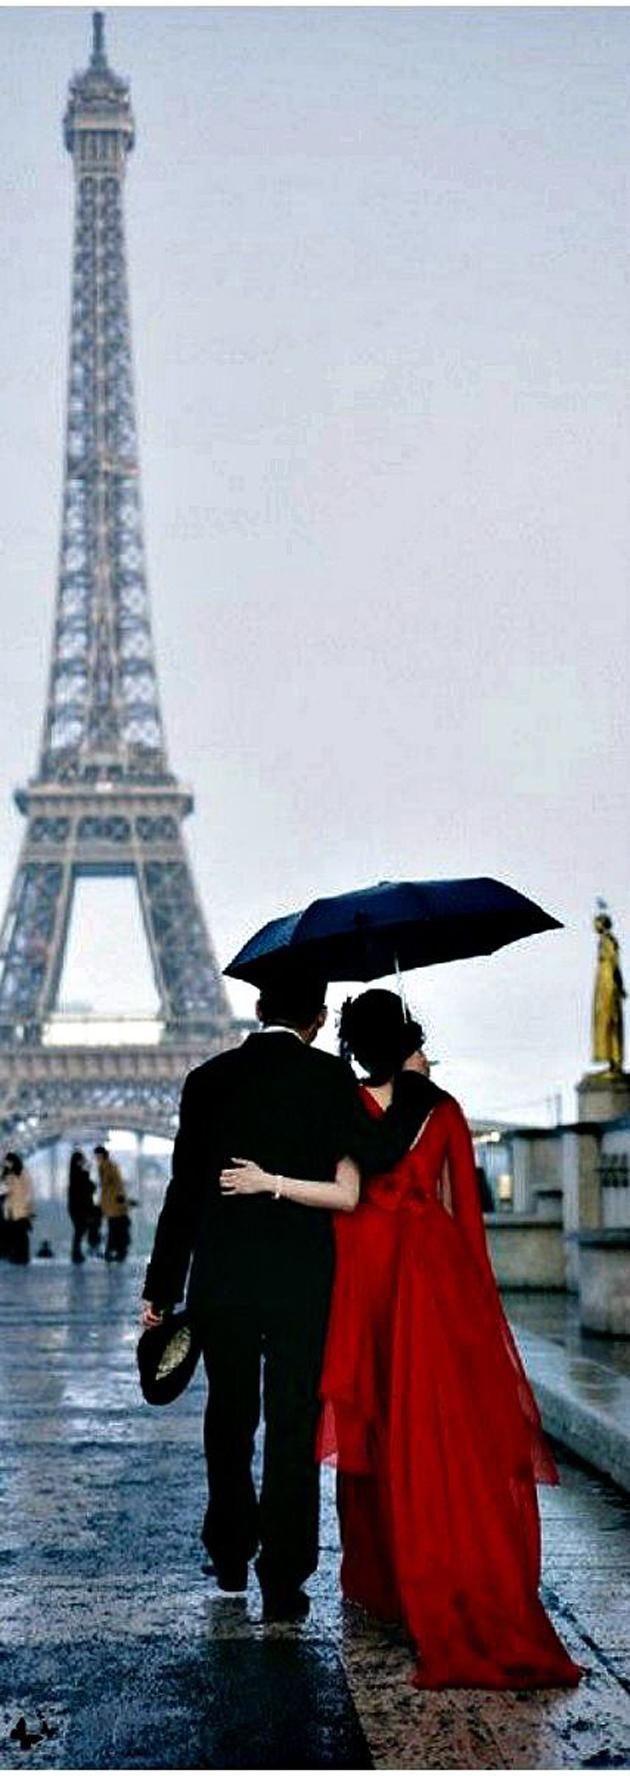 Romantic Couples Photography In Rain (56)